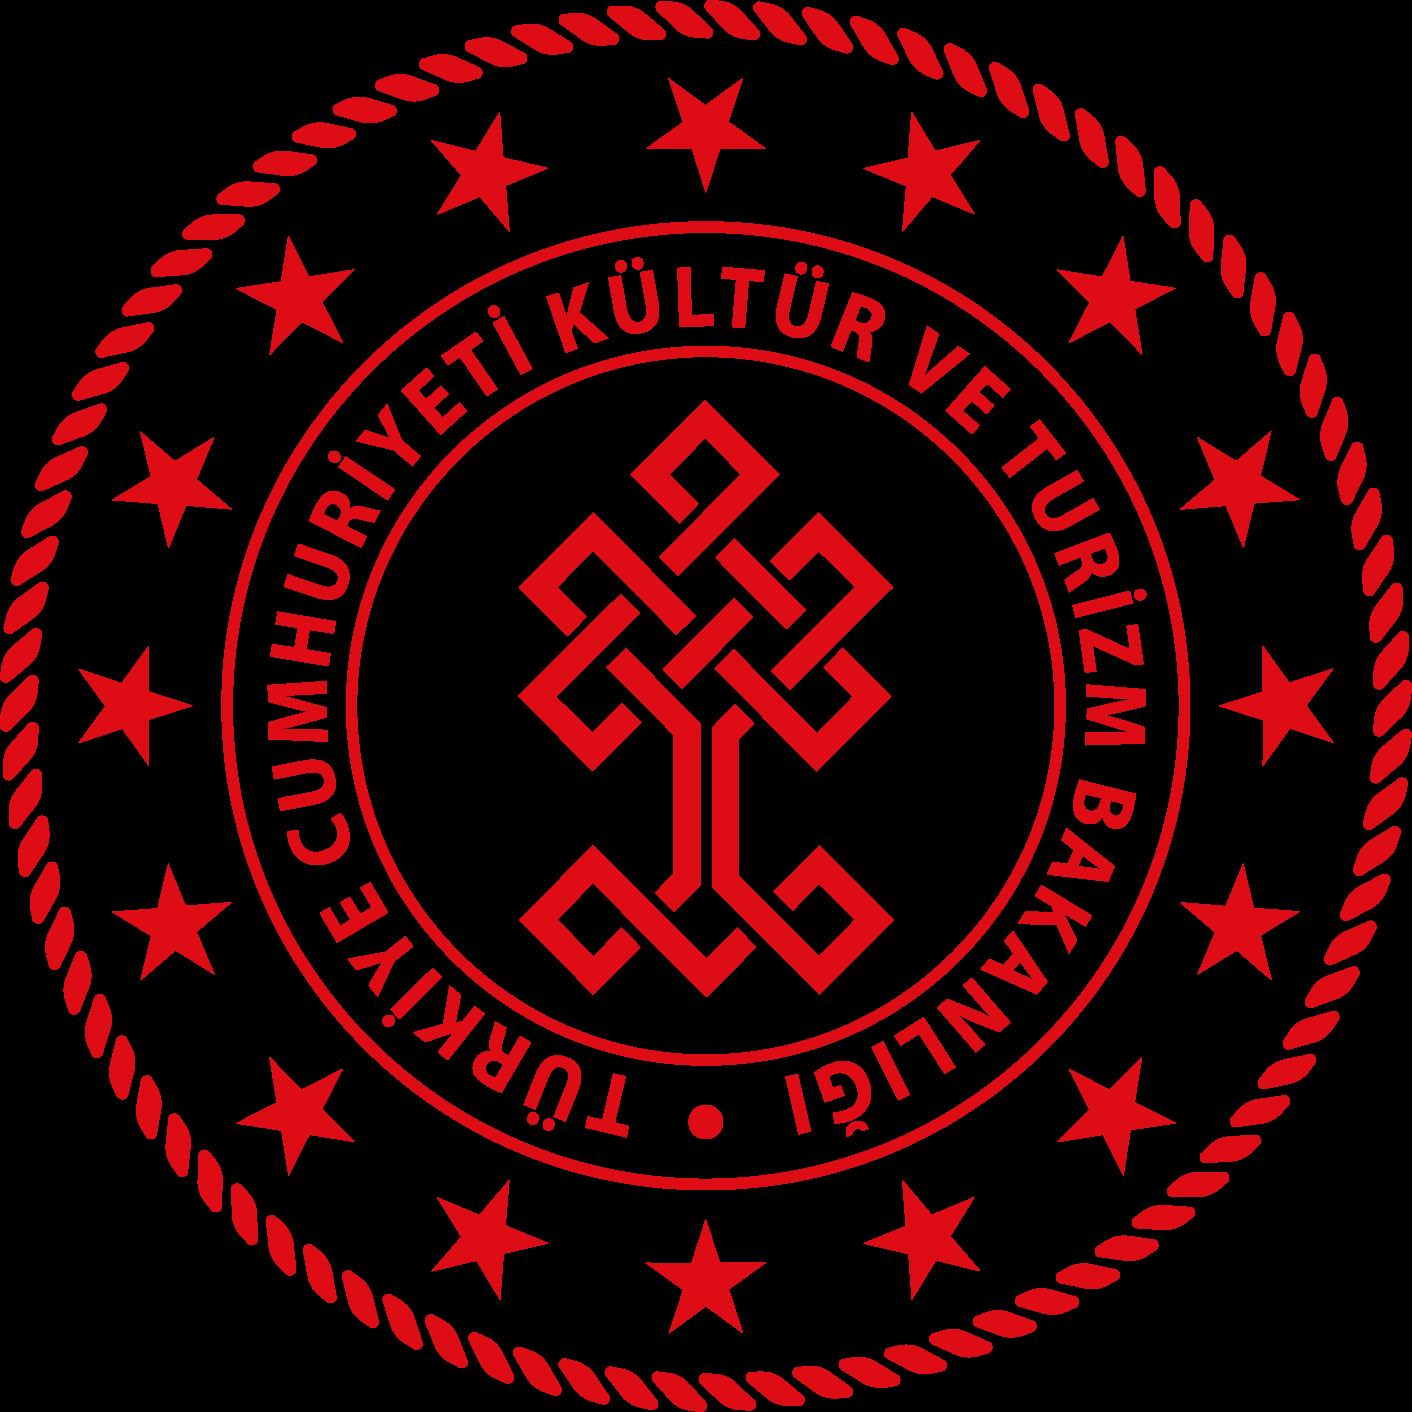 t-c-kultur-ve-turizm-bakanligi-logo